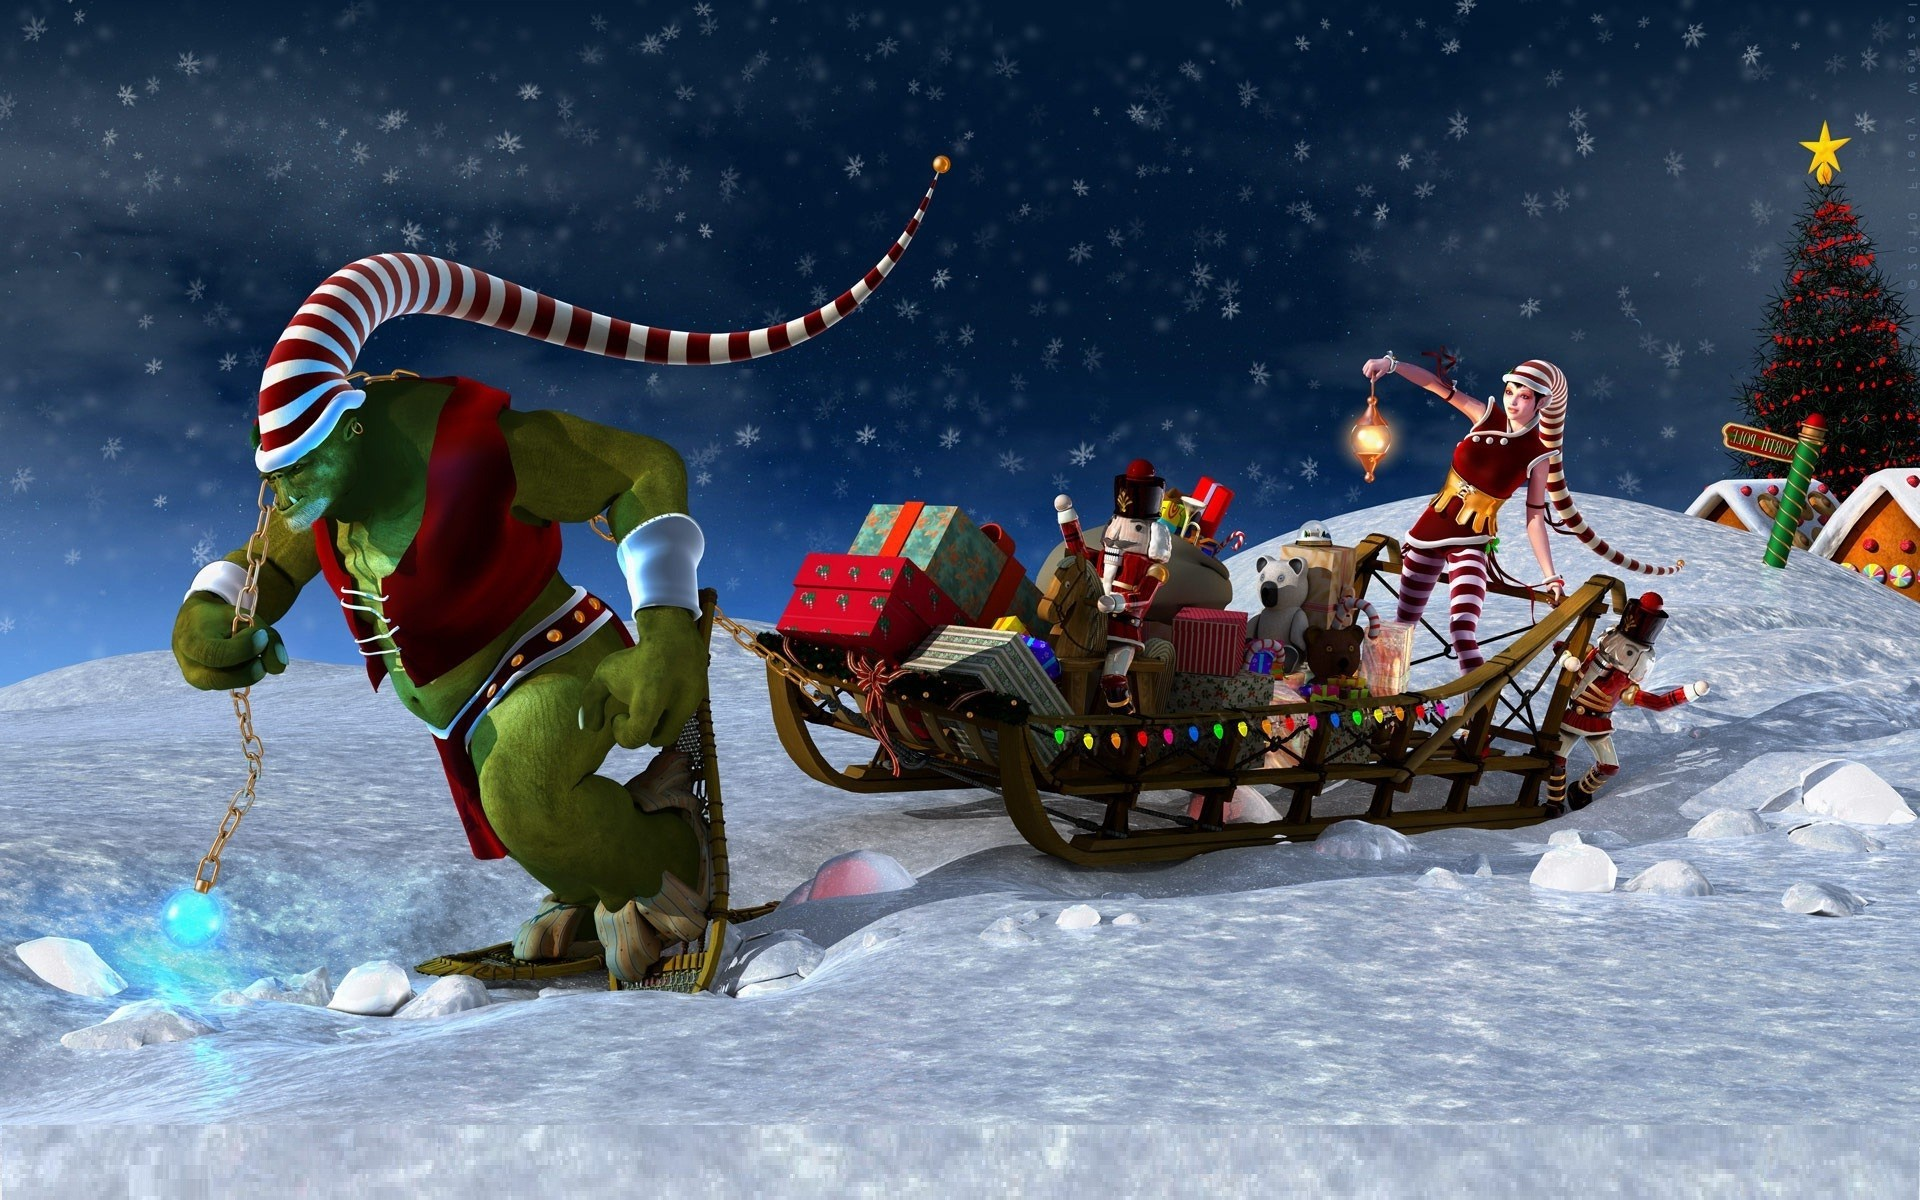 Animated Christmas Desktop Wallpaper   Wallpapers9